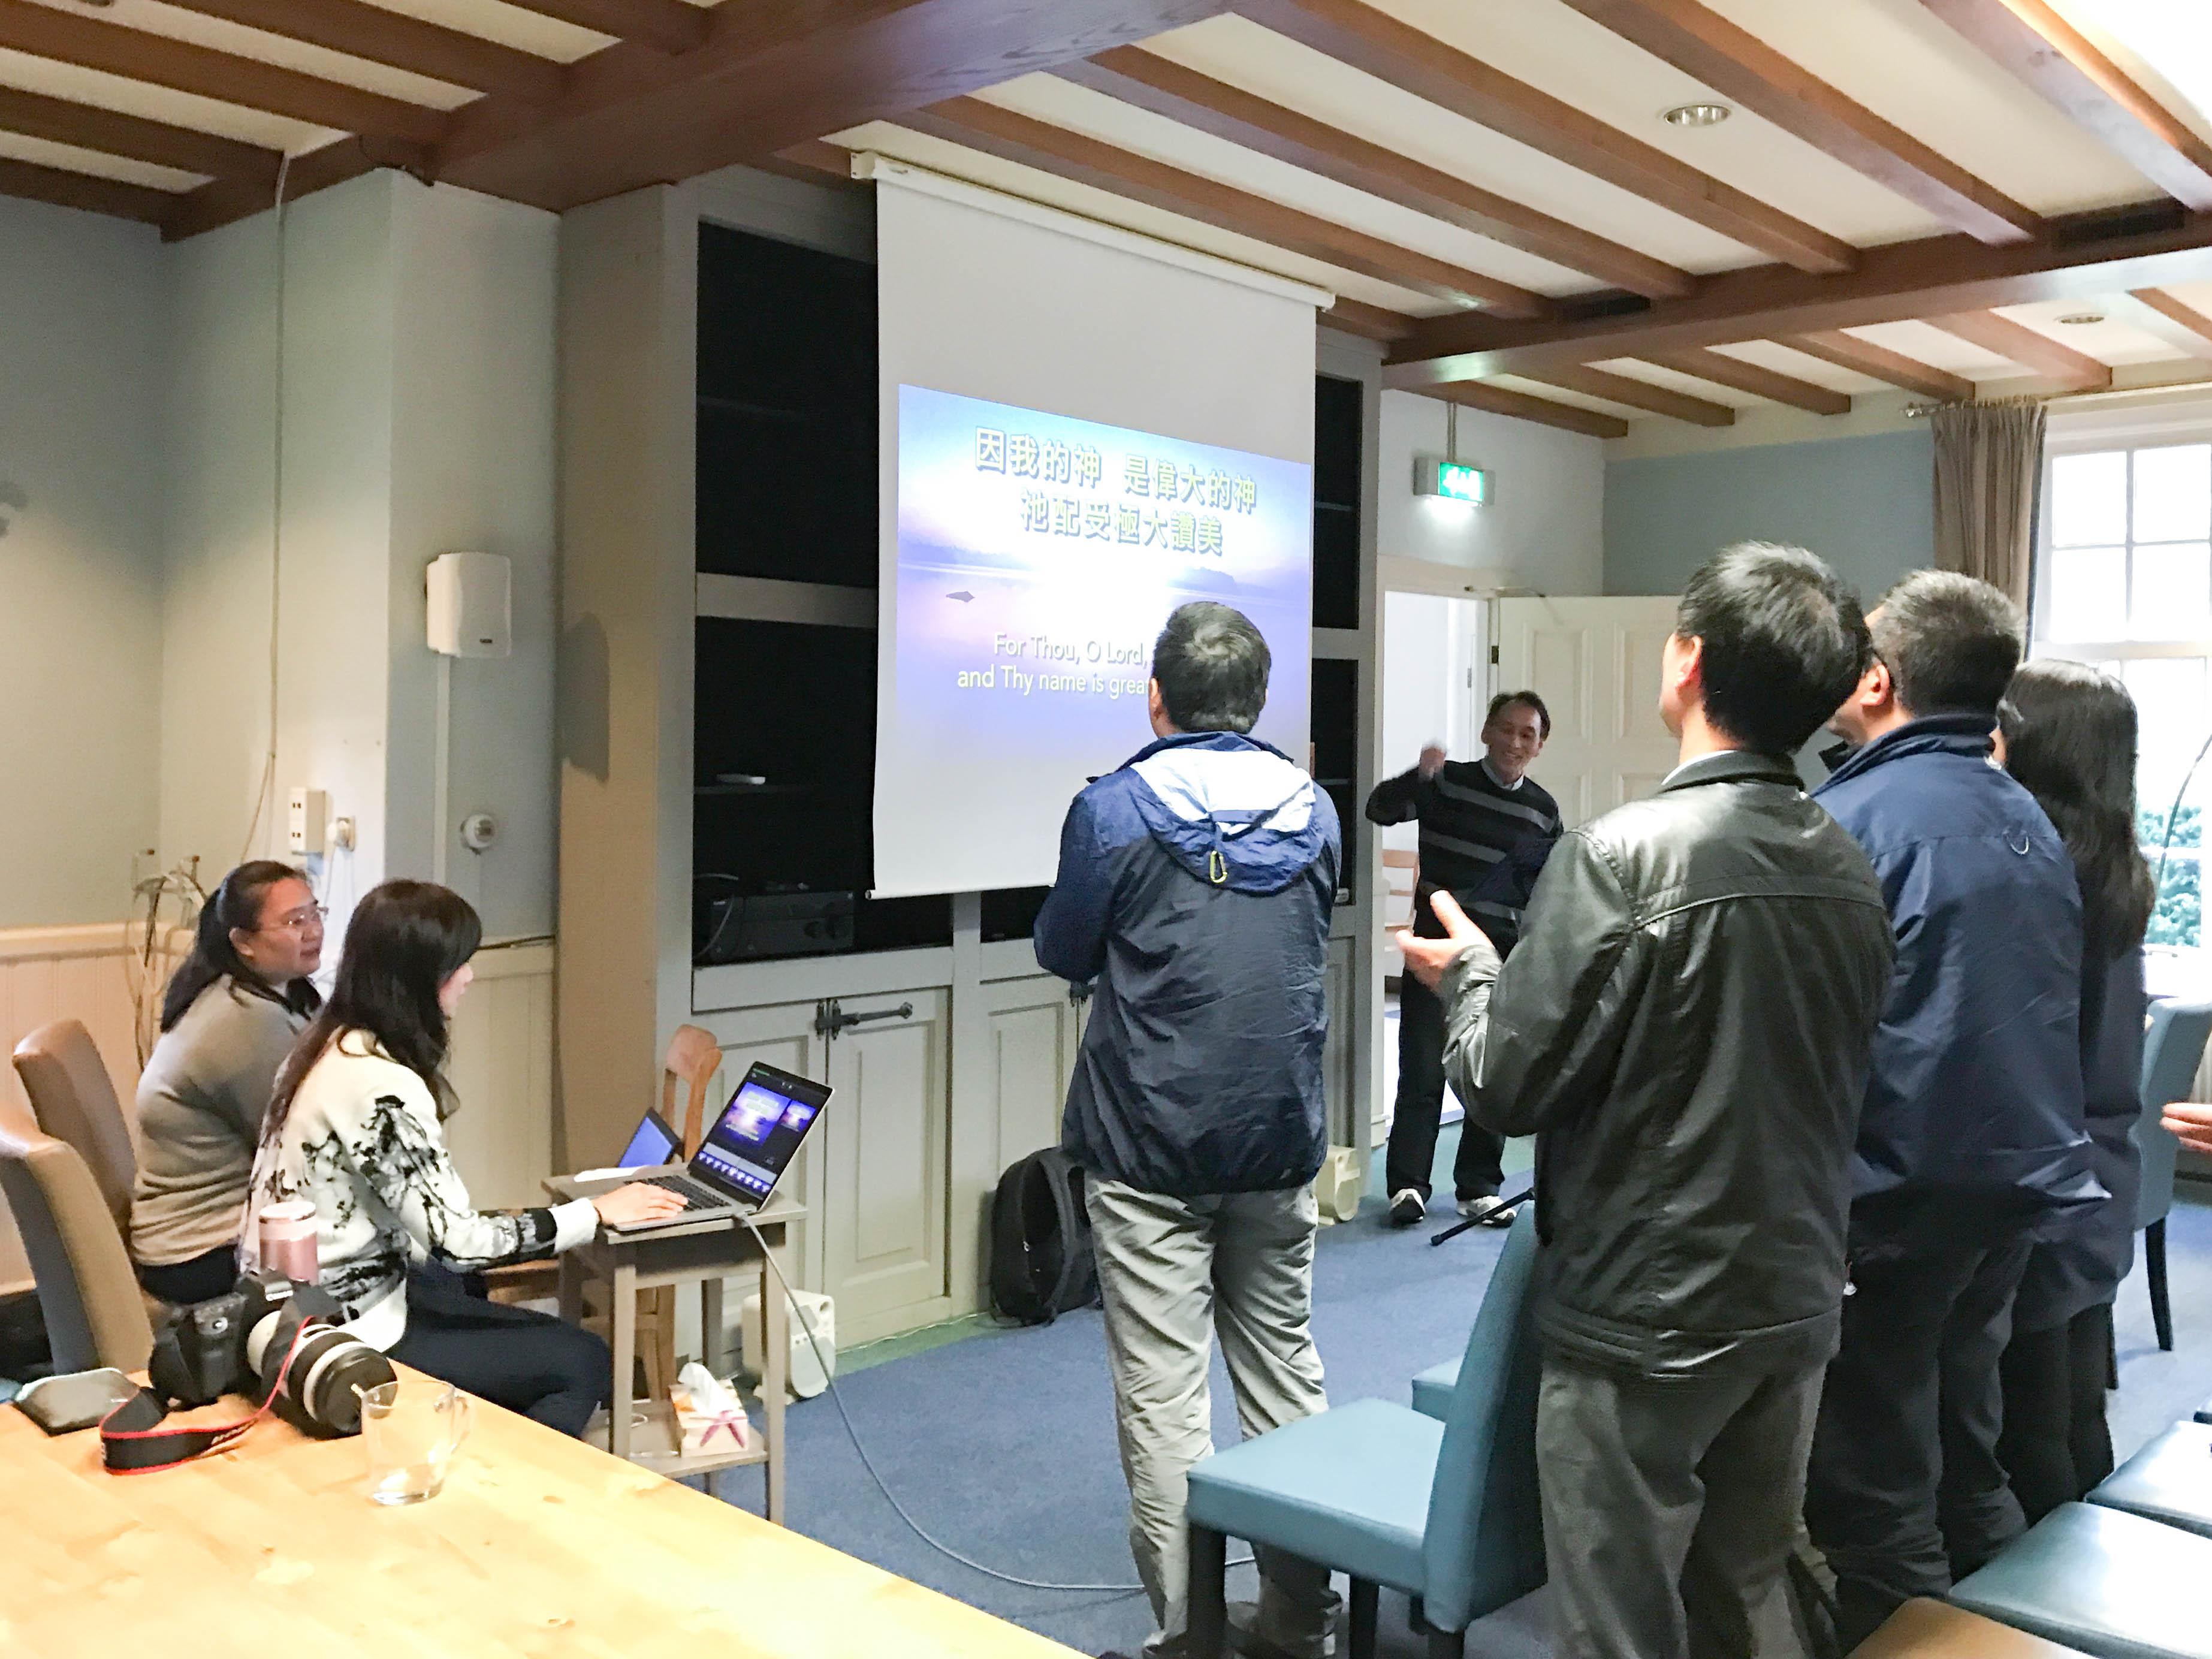 2017-Europe-Pastors-Retreat-00005